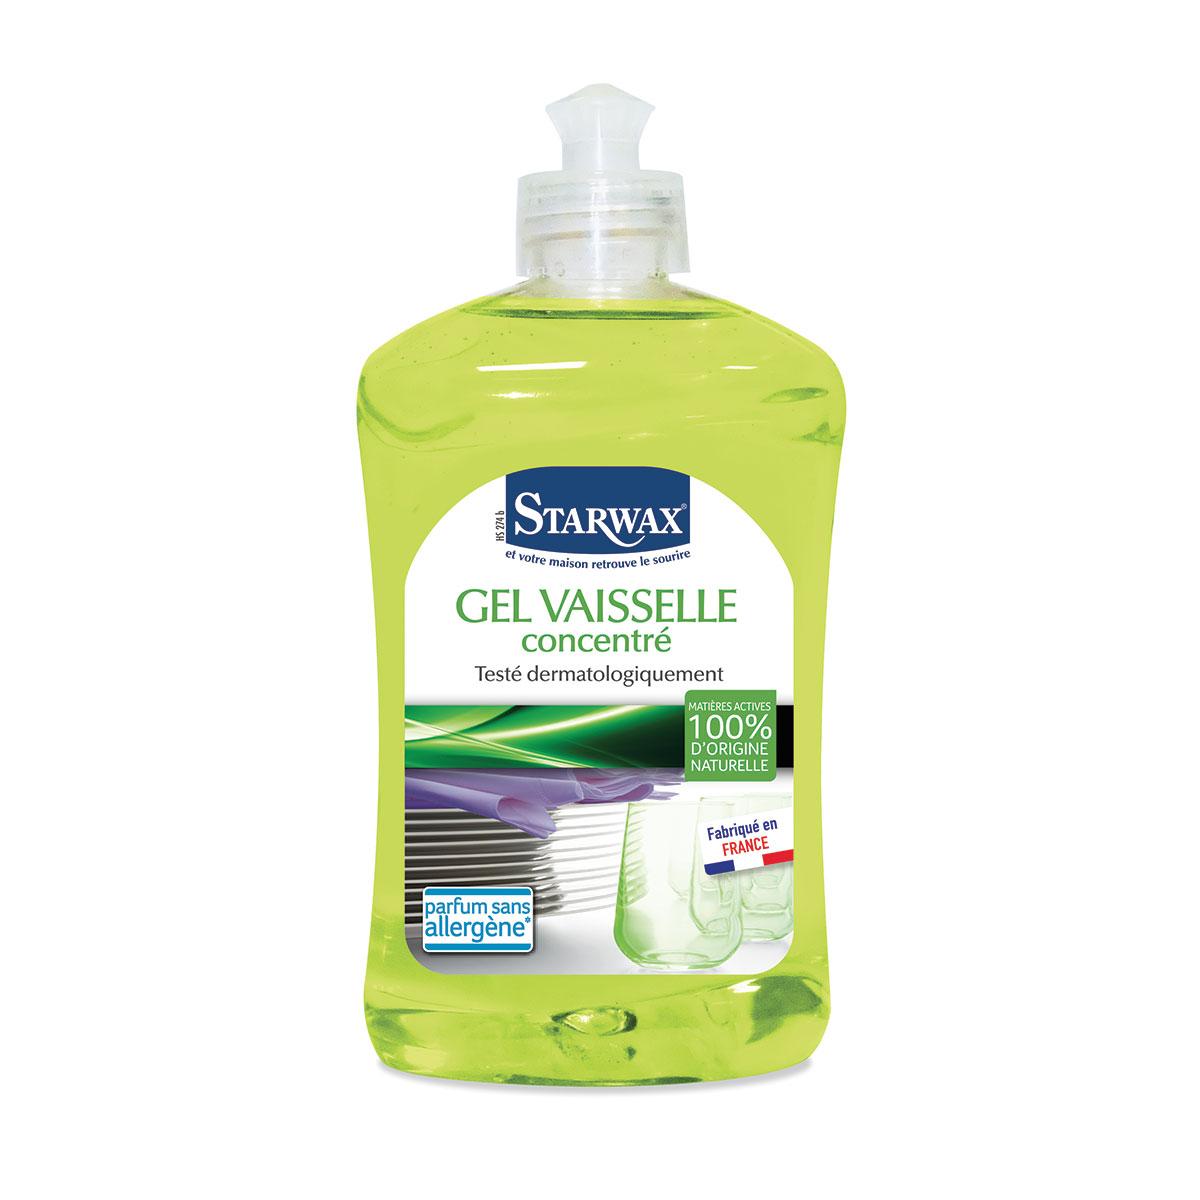 Gel vaisselle avec matières actives 100% d'origine naturelle - Starwax